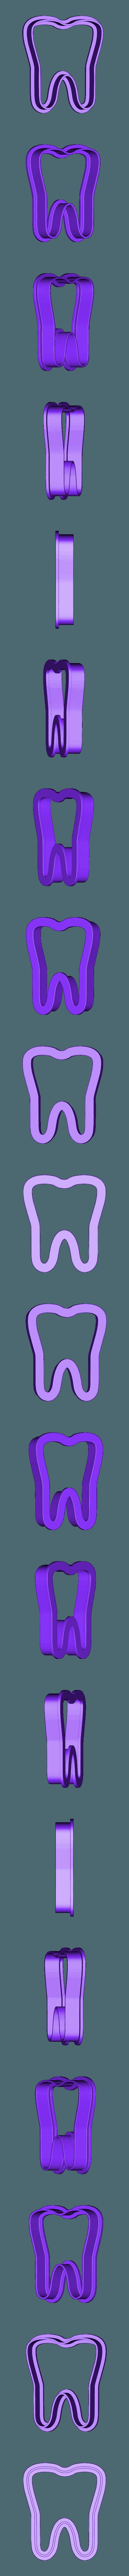 muela.stl Download free STL file Cookie Cutter Tooth • 3D printable model, godaon